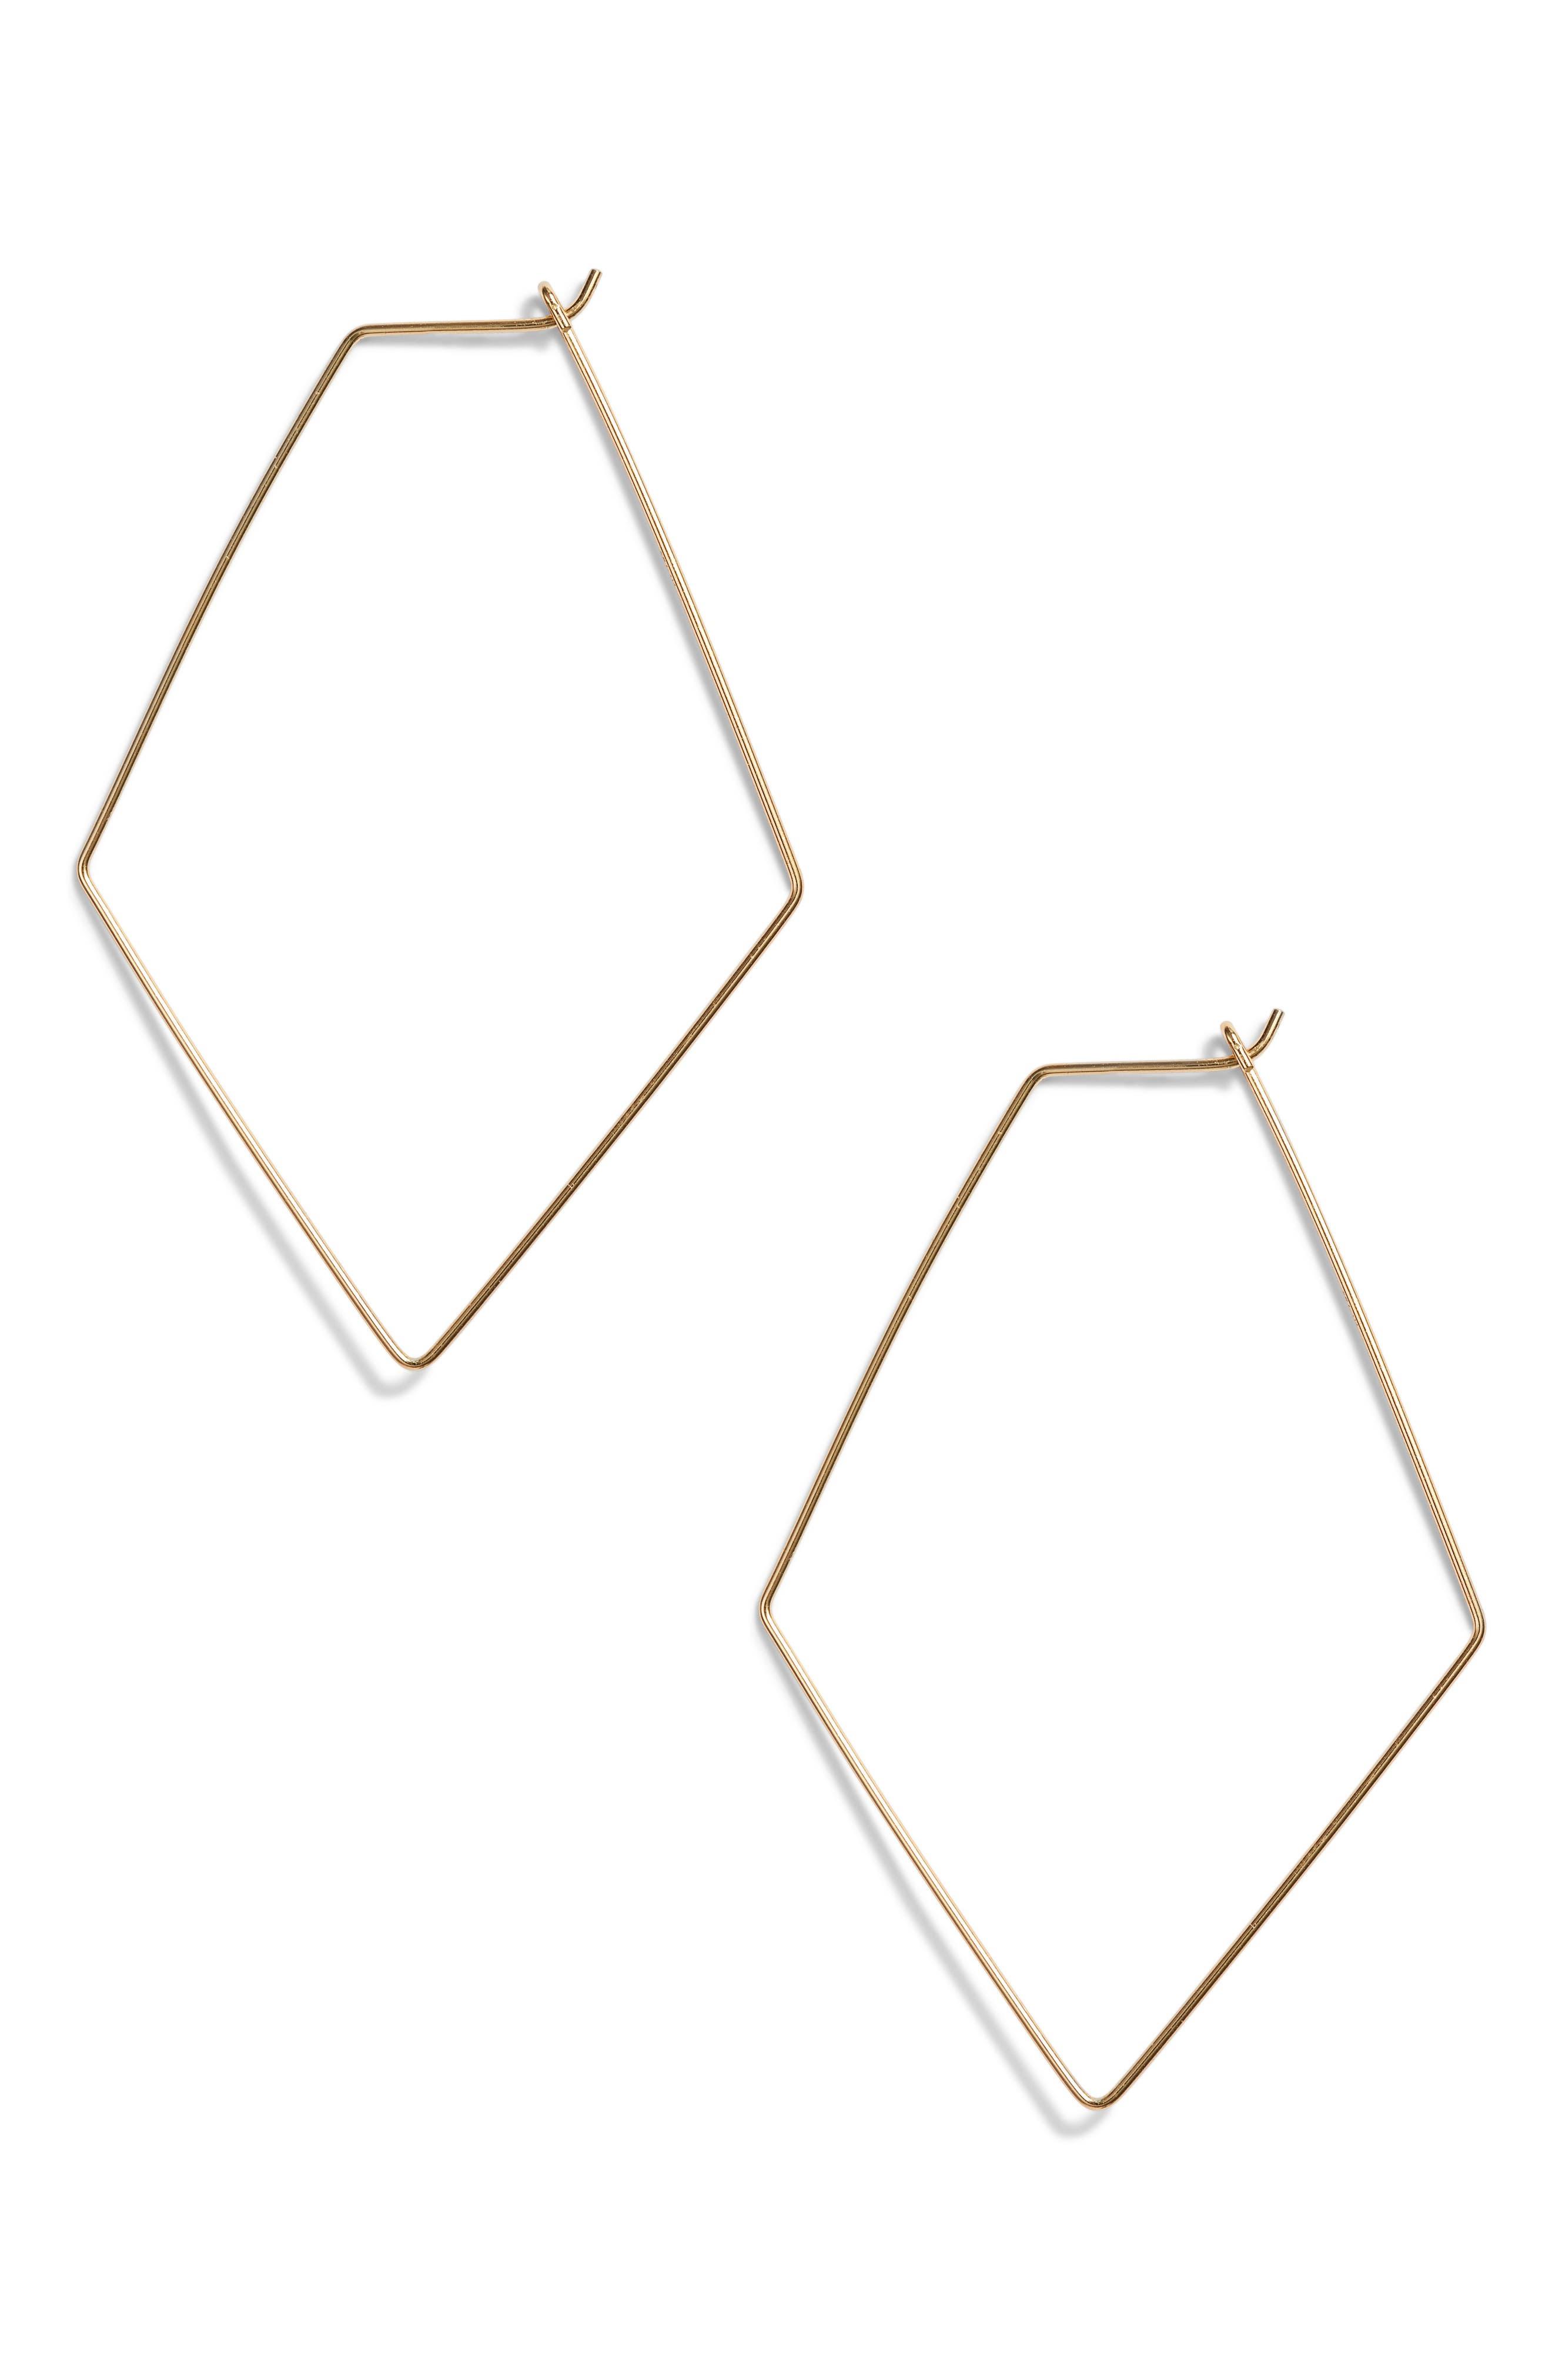 Rhombus Hoop Earrings,                             Main thumbnail 1, color,                             Gold